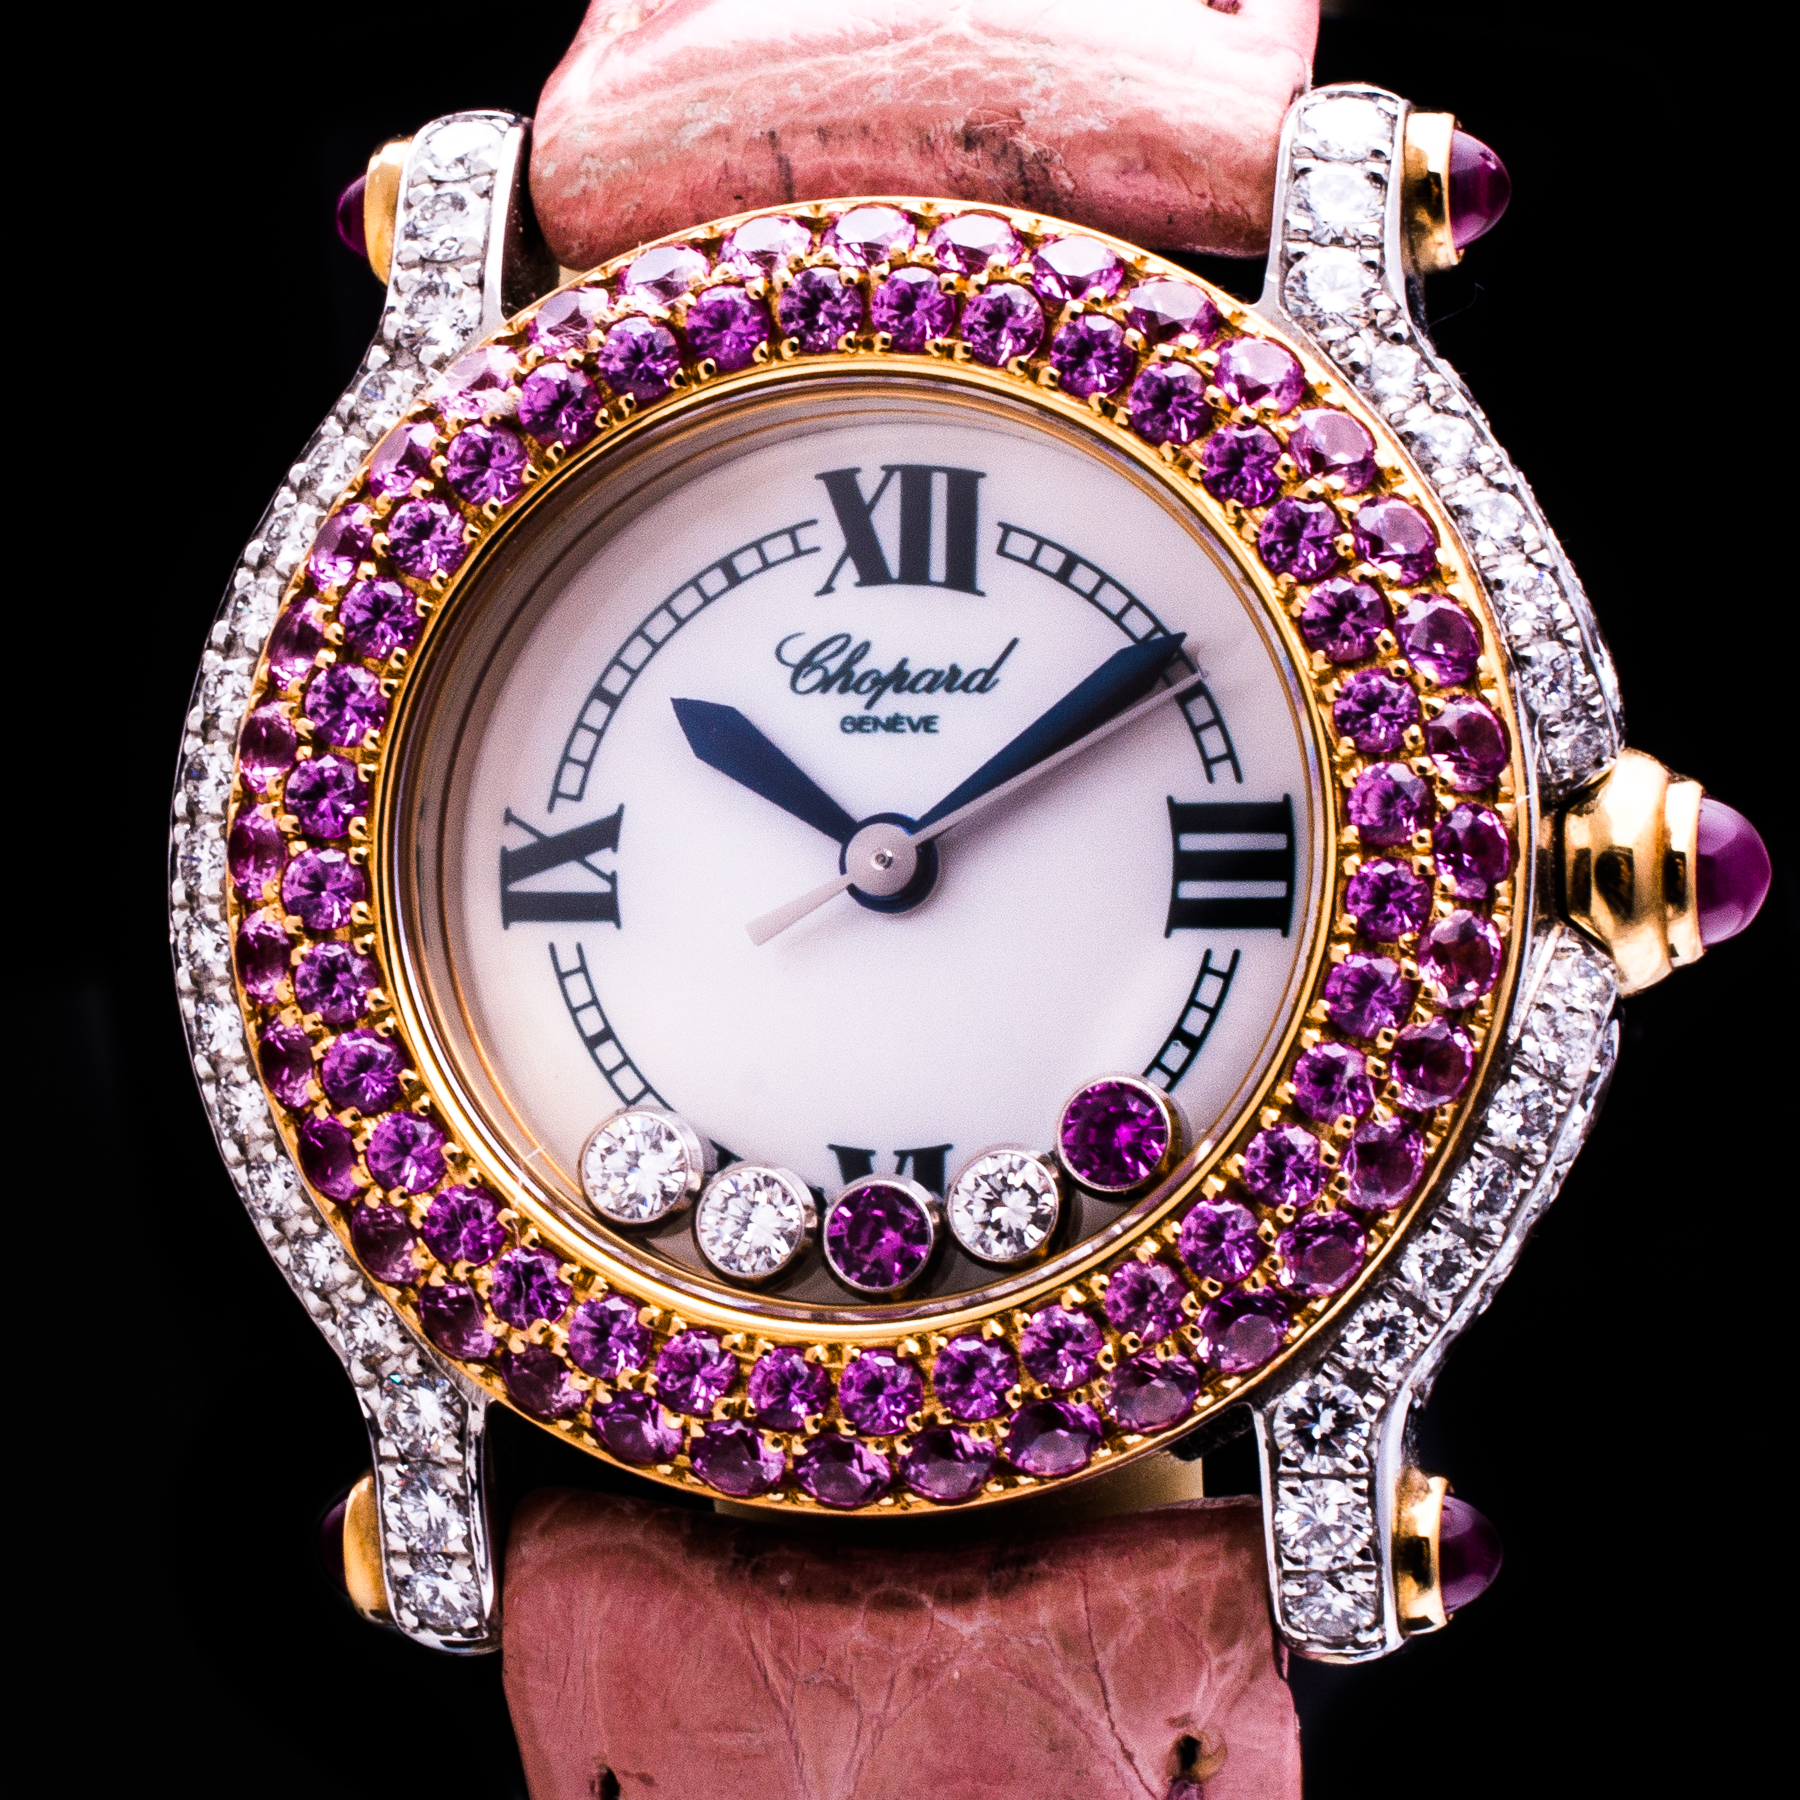 Happy Sport Lady 18K Gold/Weissgold Perlmutt Pink Diamonds